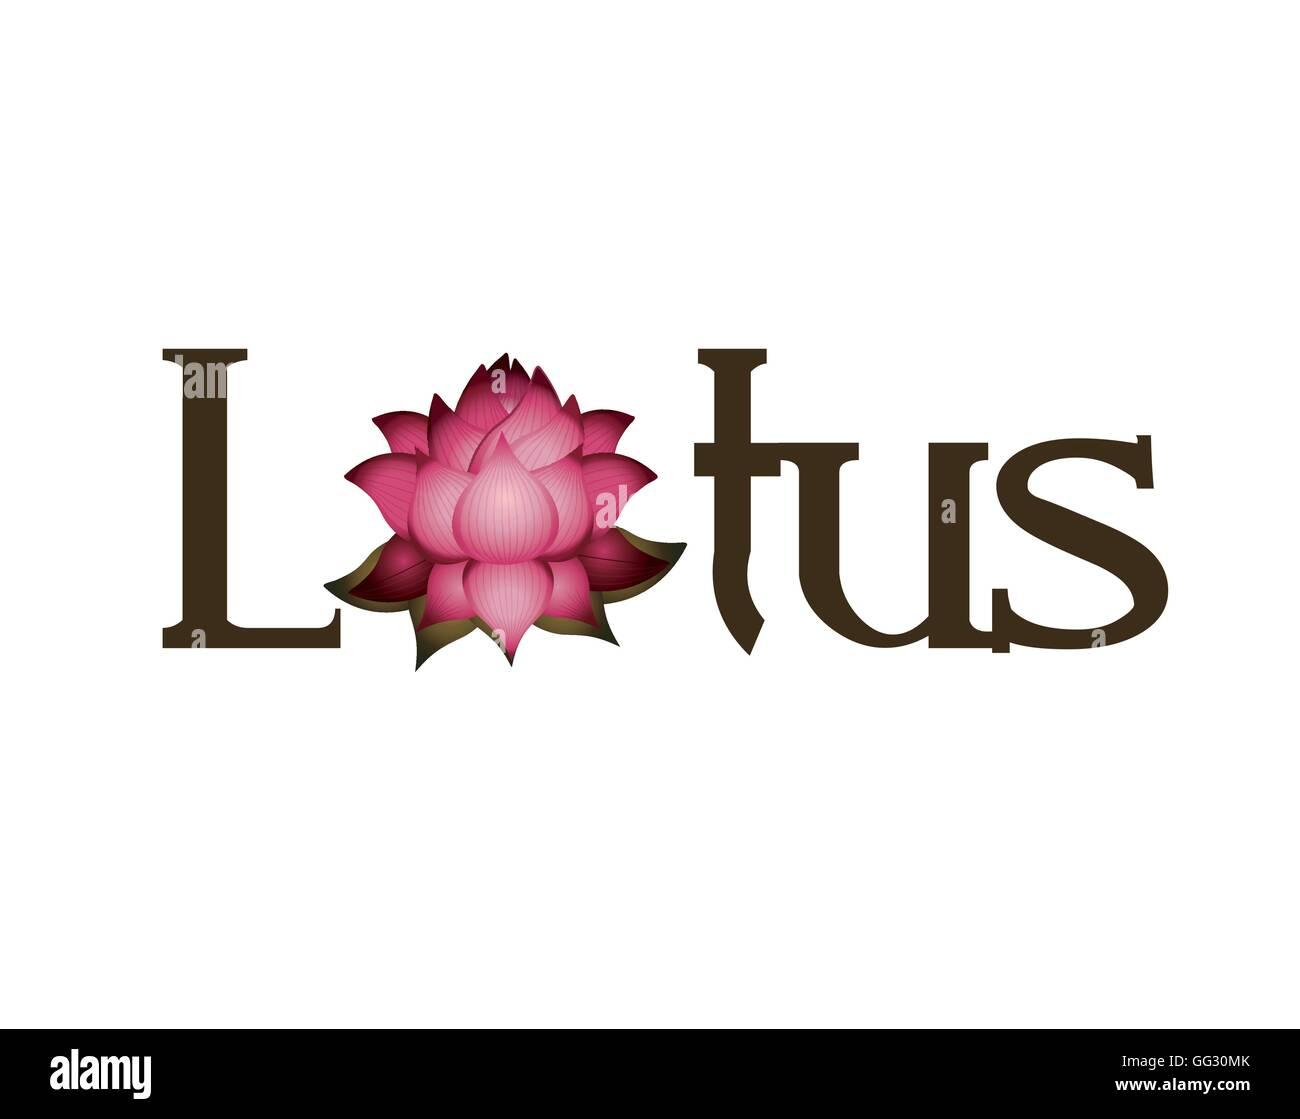 Lotus flower word icon stock vector art illustration vector image lotus flower word icon mightylinksfo